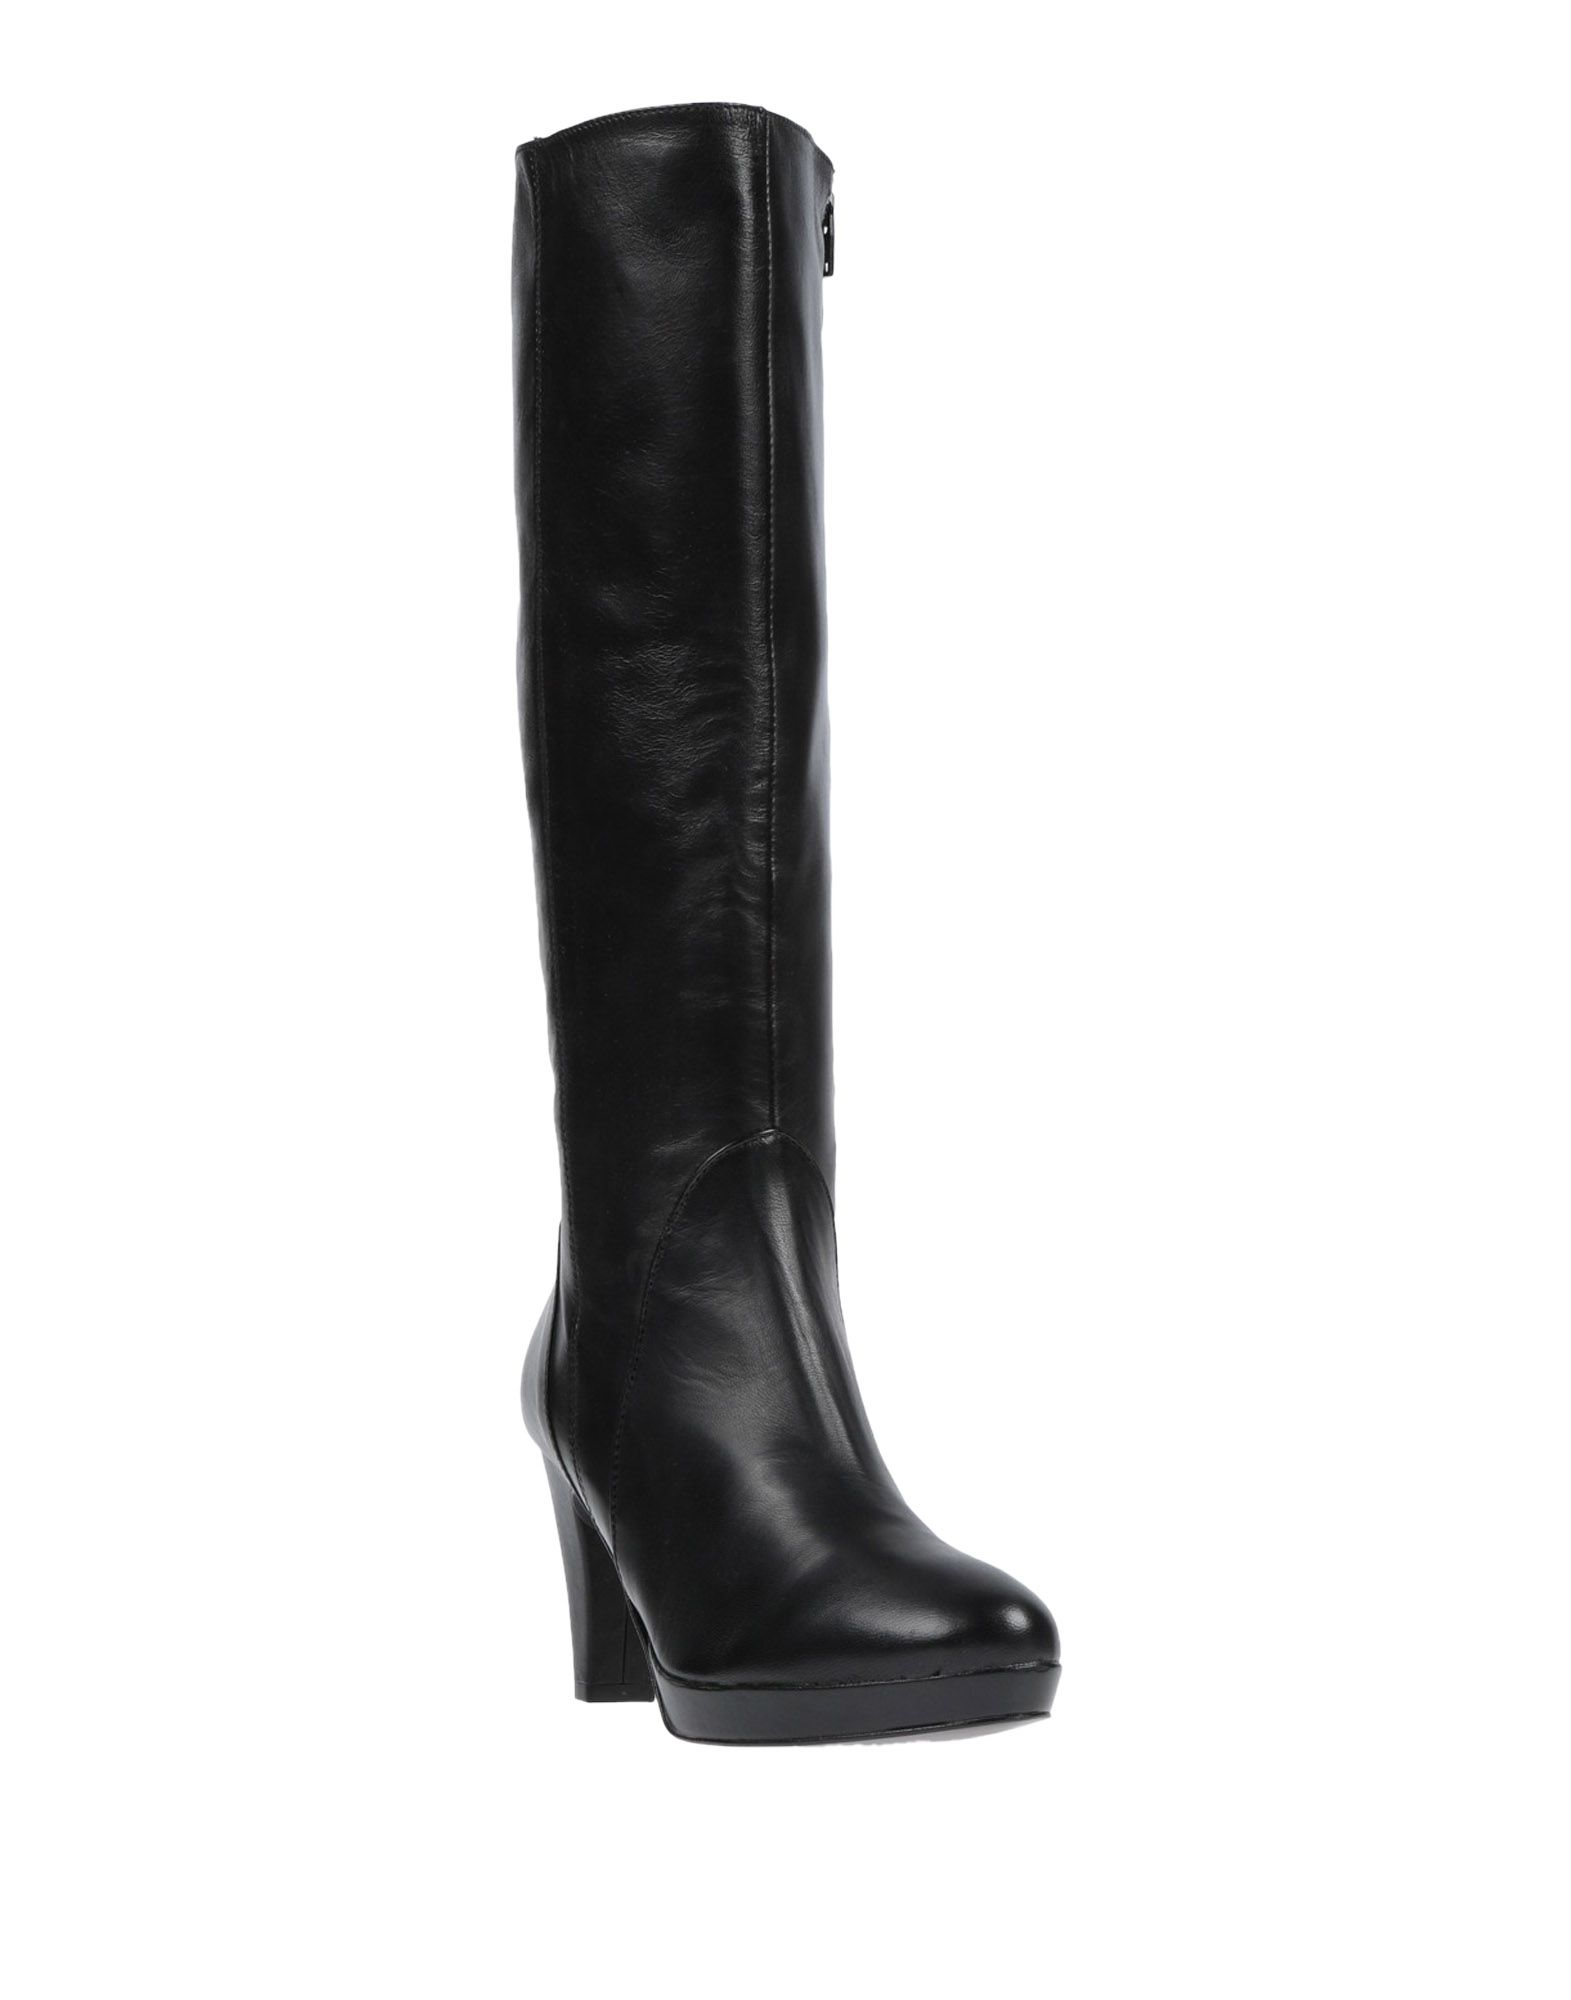 Chocolà Stiefel strapazierfähige Damen  11526257JDGut aussehende strapazierfähige Stiefel Schuhe 624c4e